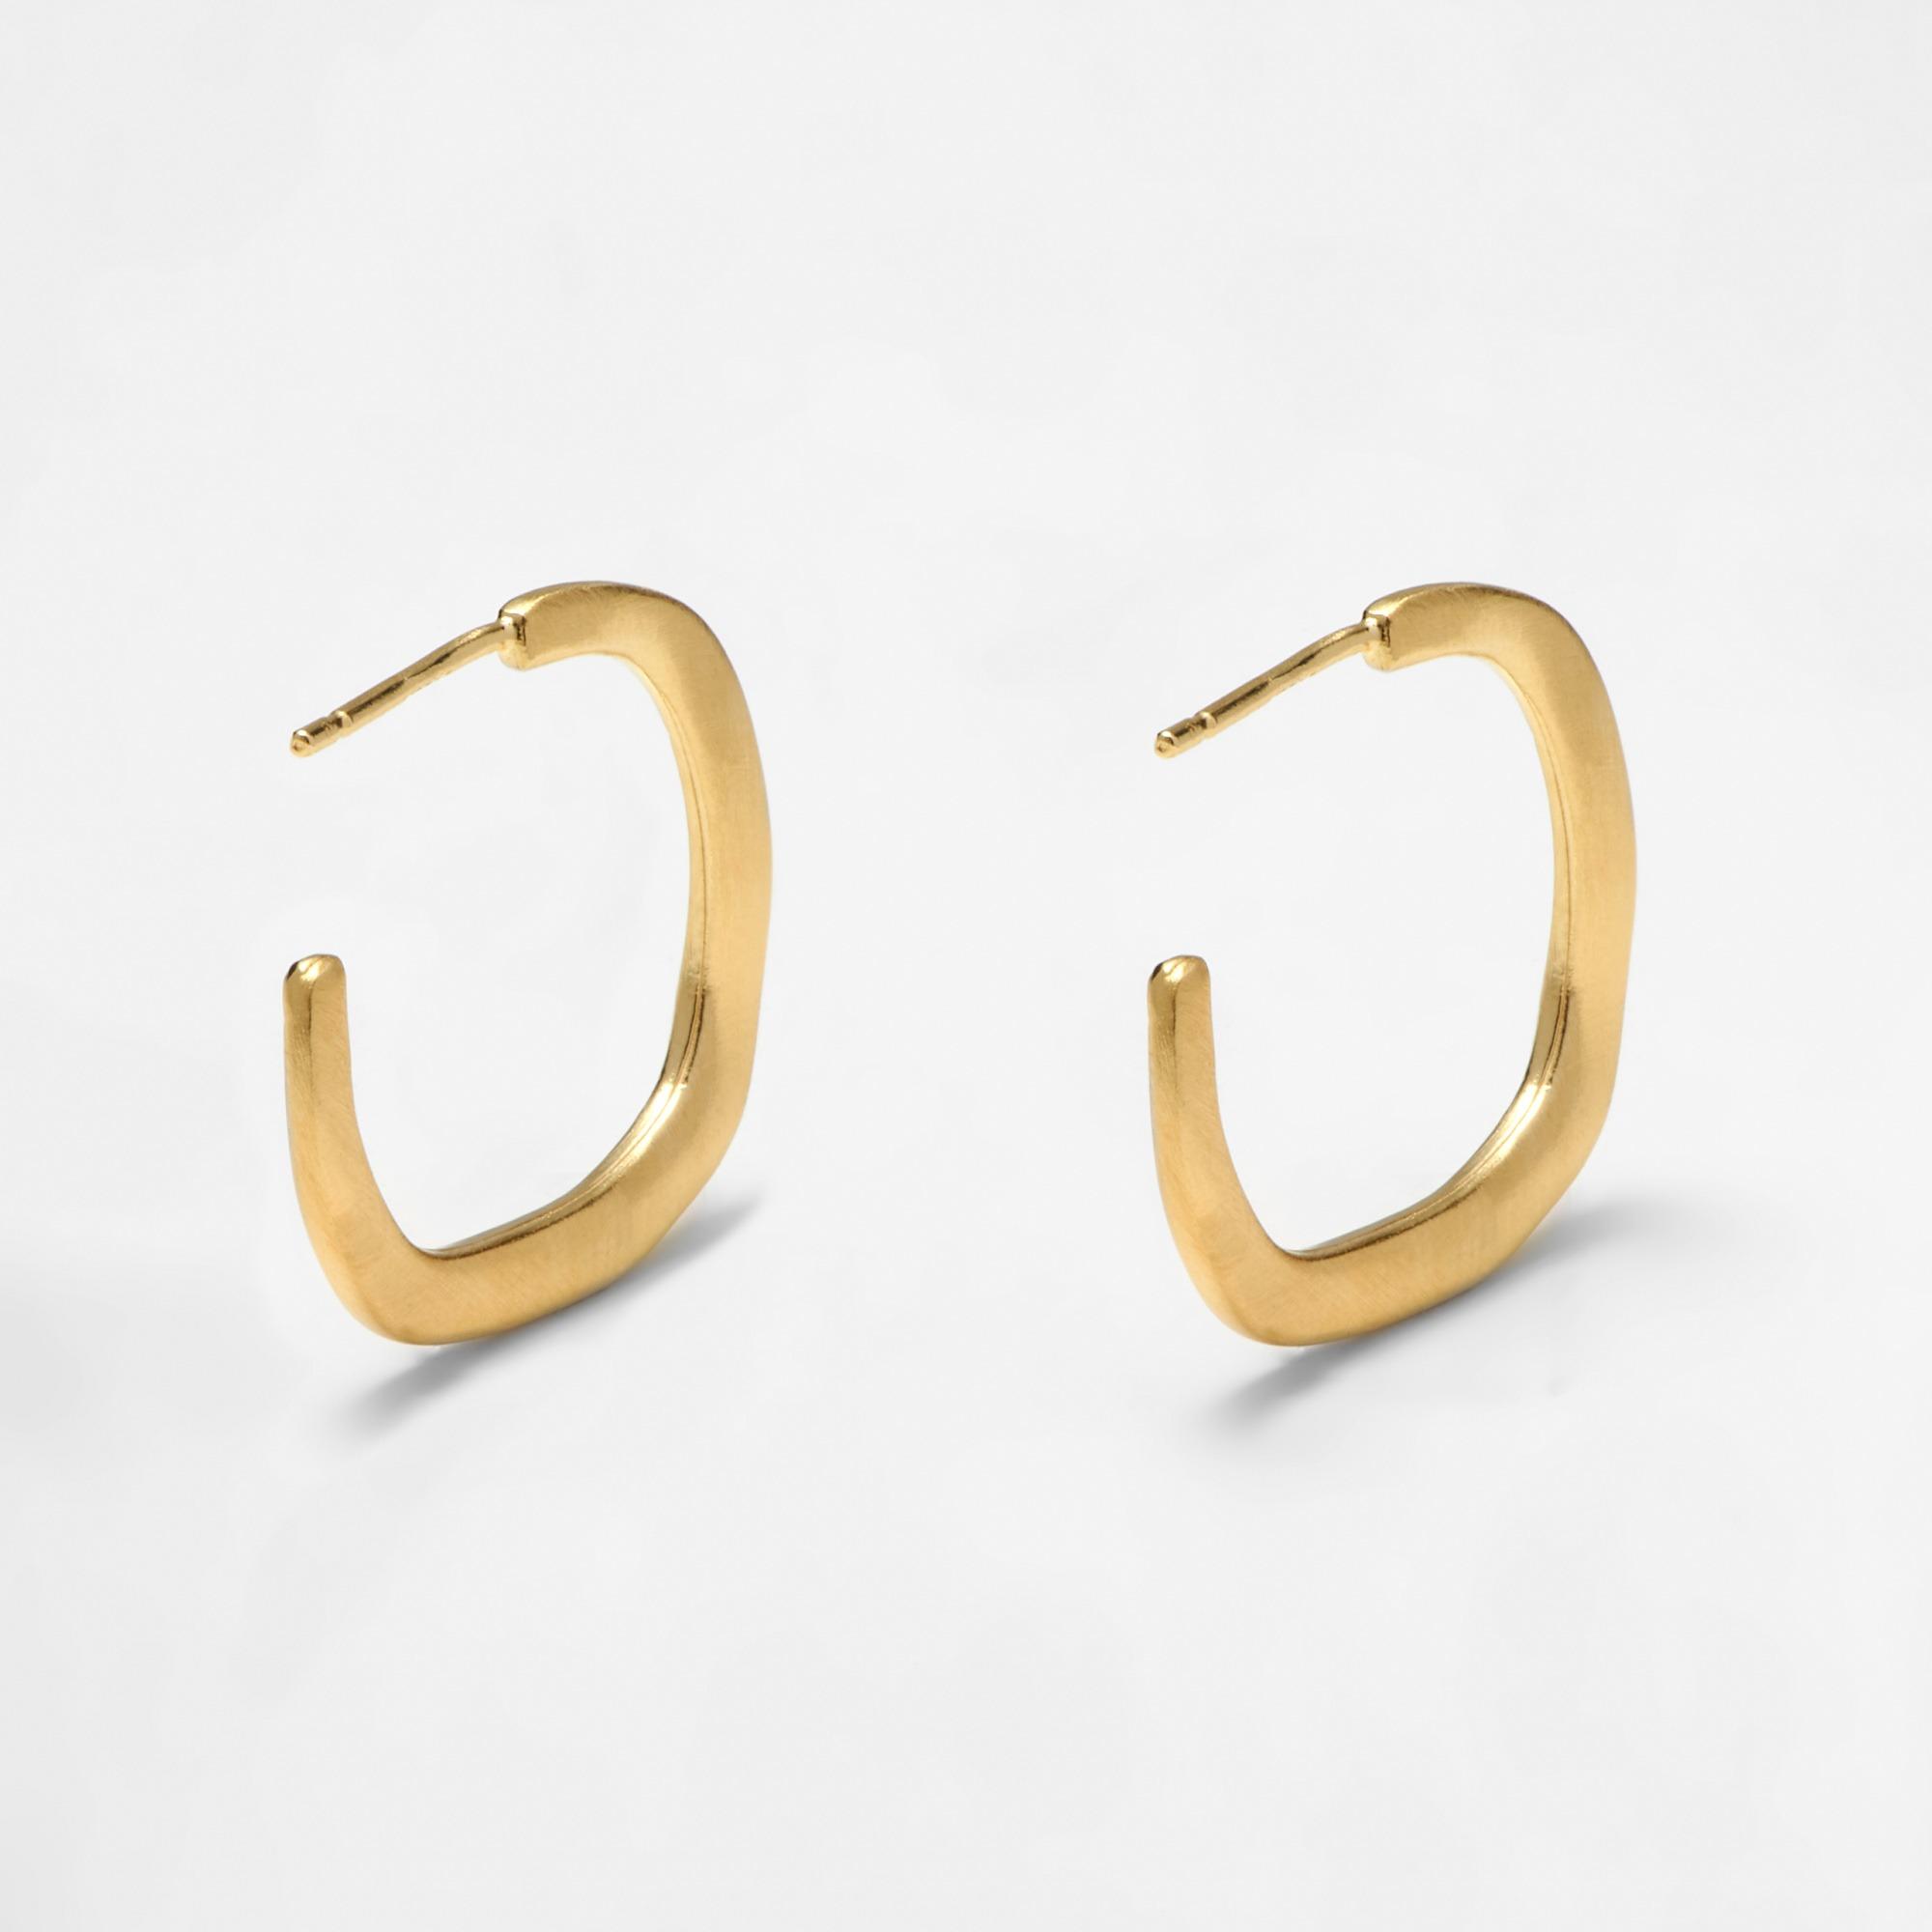 100-17 Square hoops σκουλαρίκια χρυσά